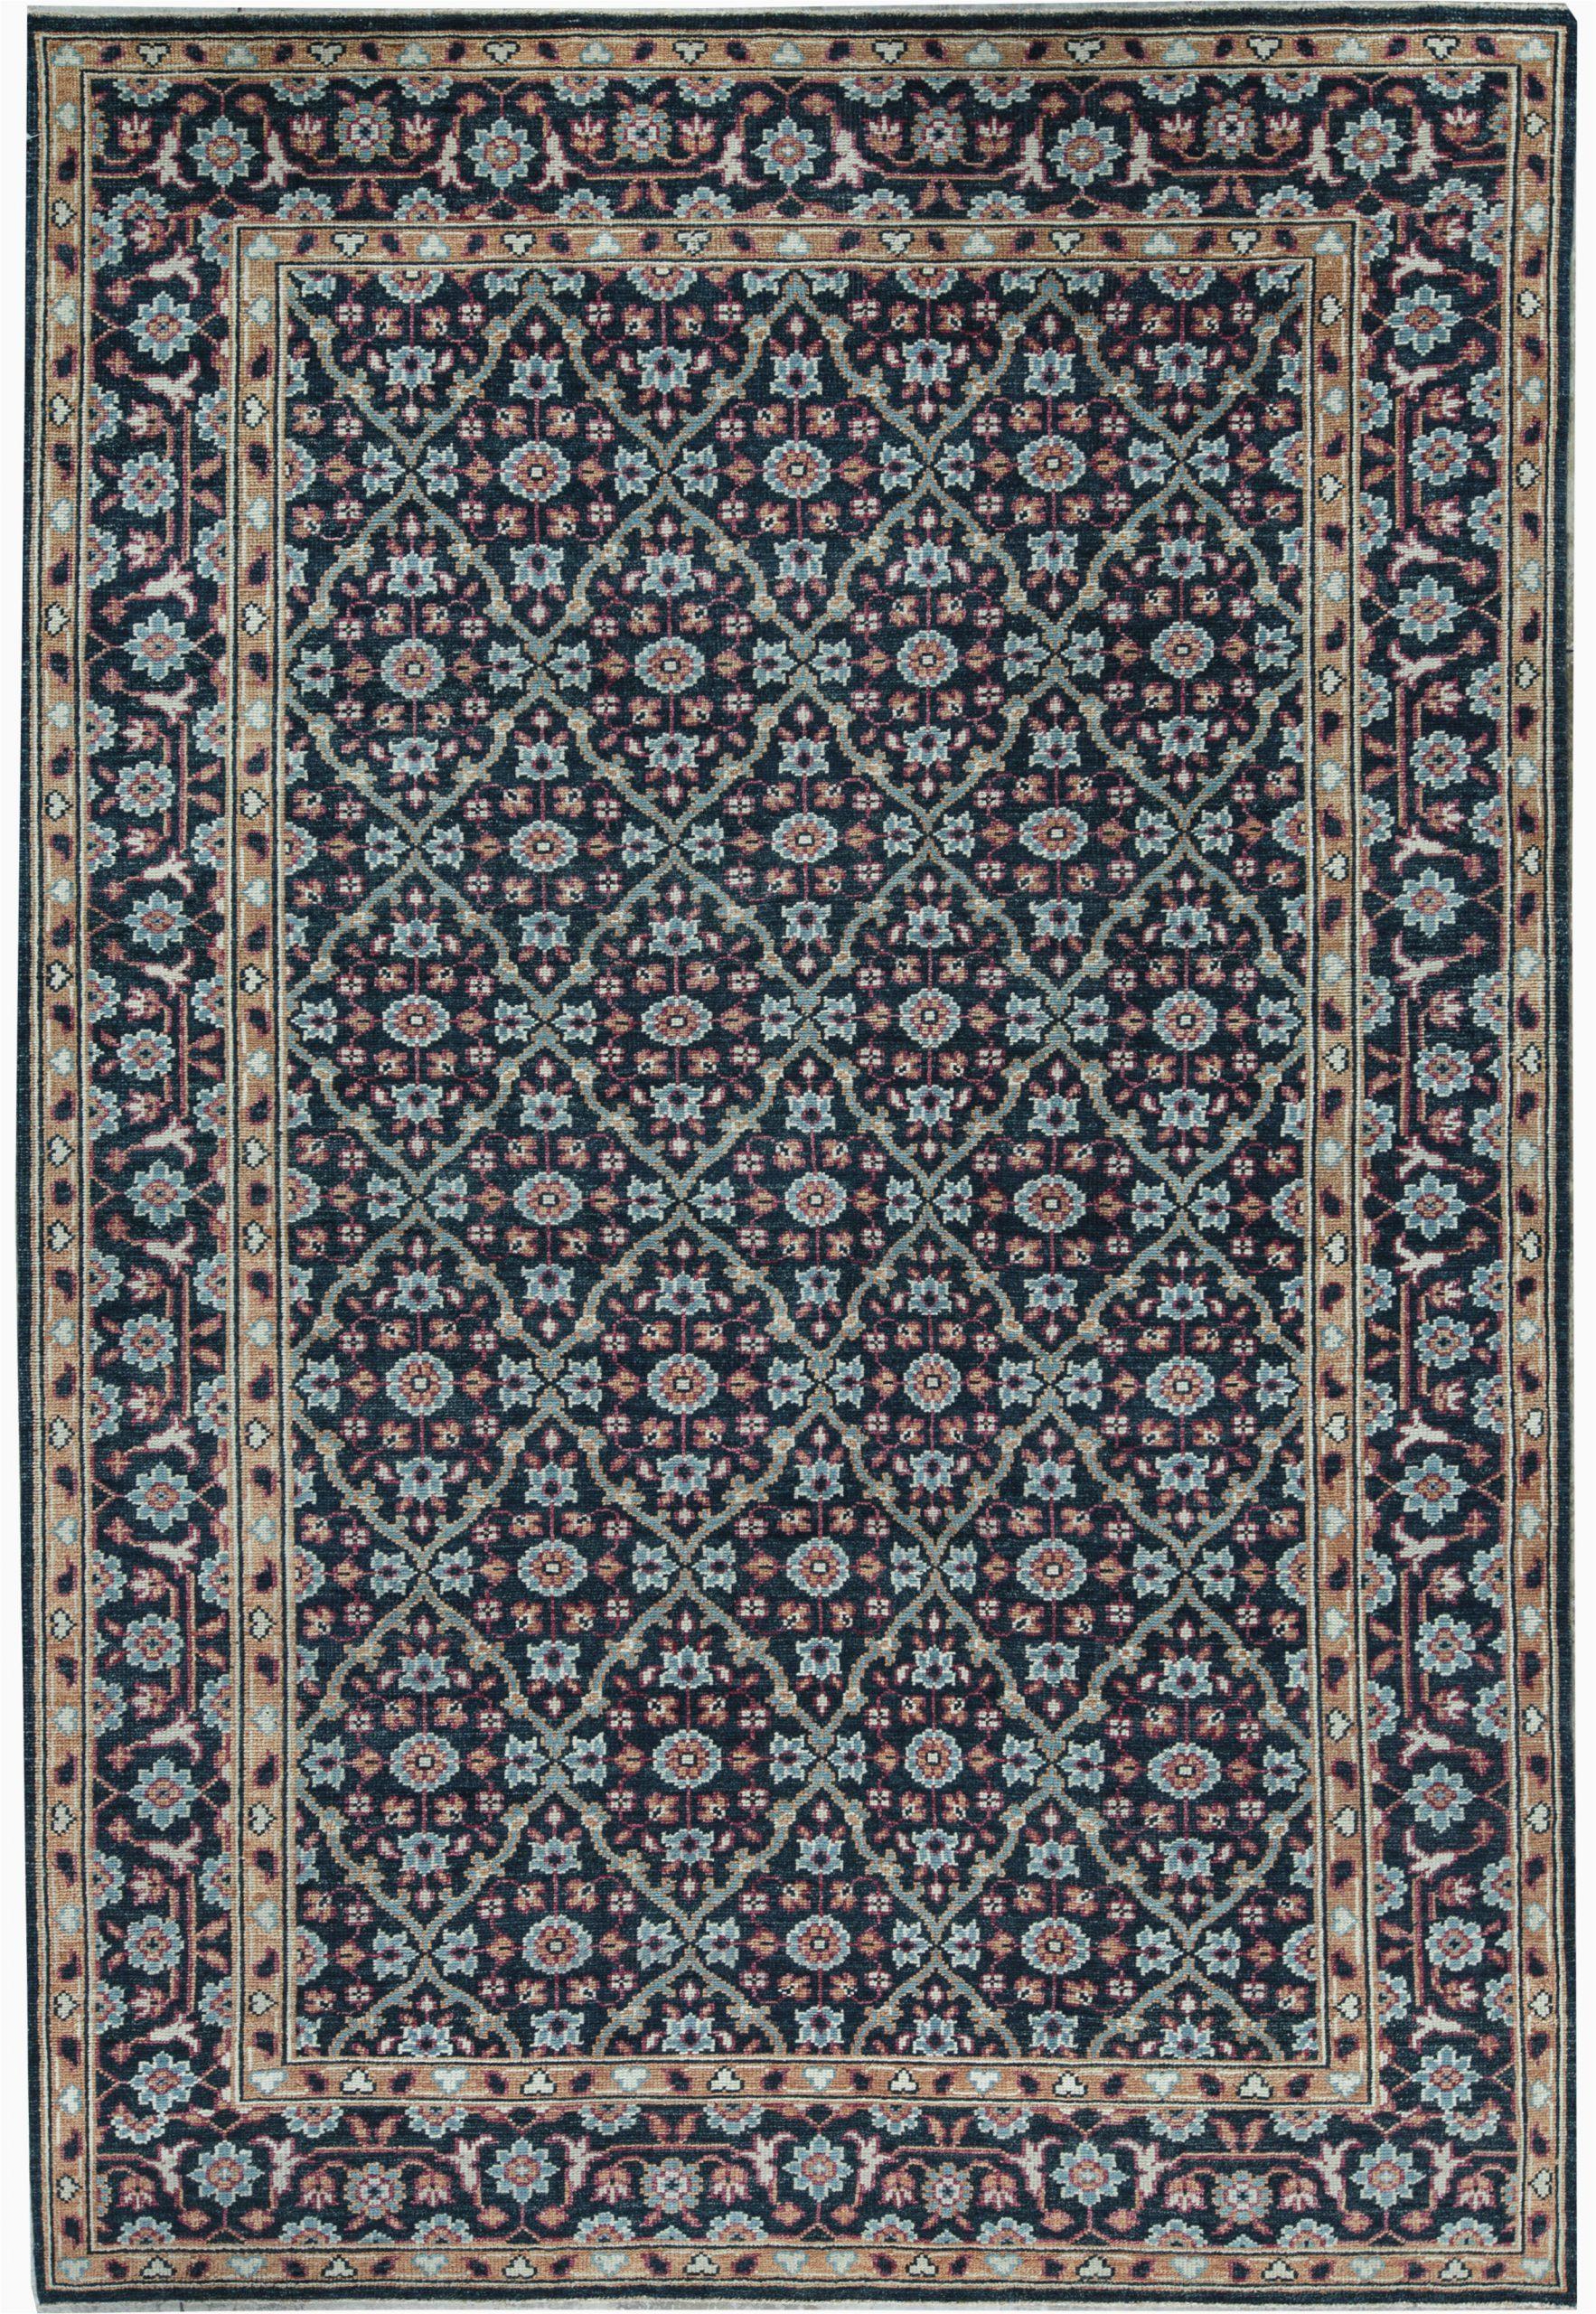 bokara rug co inc one of a kind soho hand knotted navy 97 x 1310 area rug abhd5555